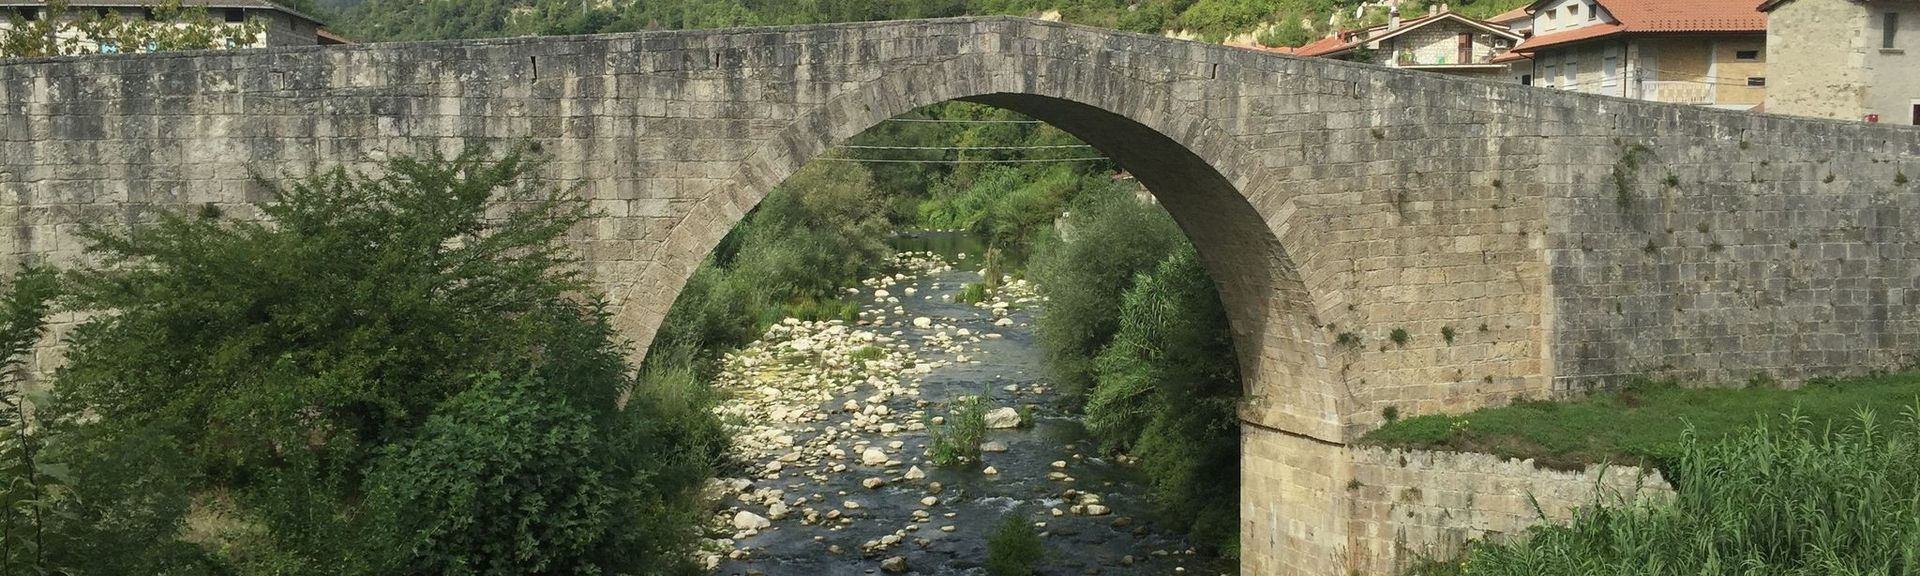 Acquasanta Terme, Marche, Włochy